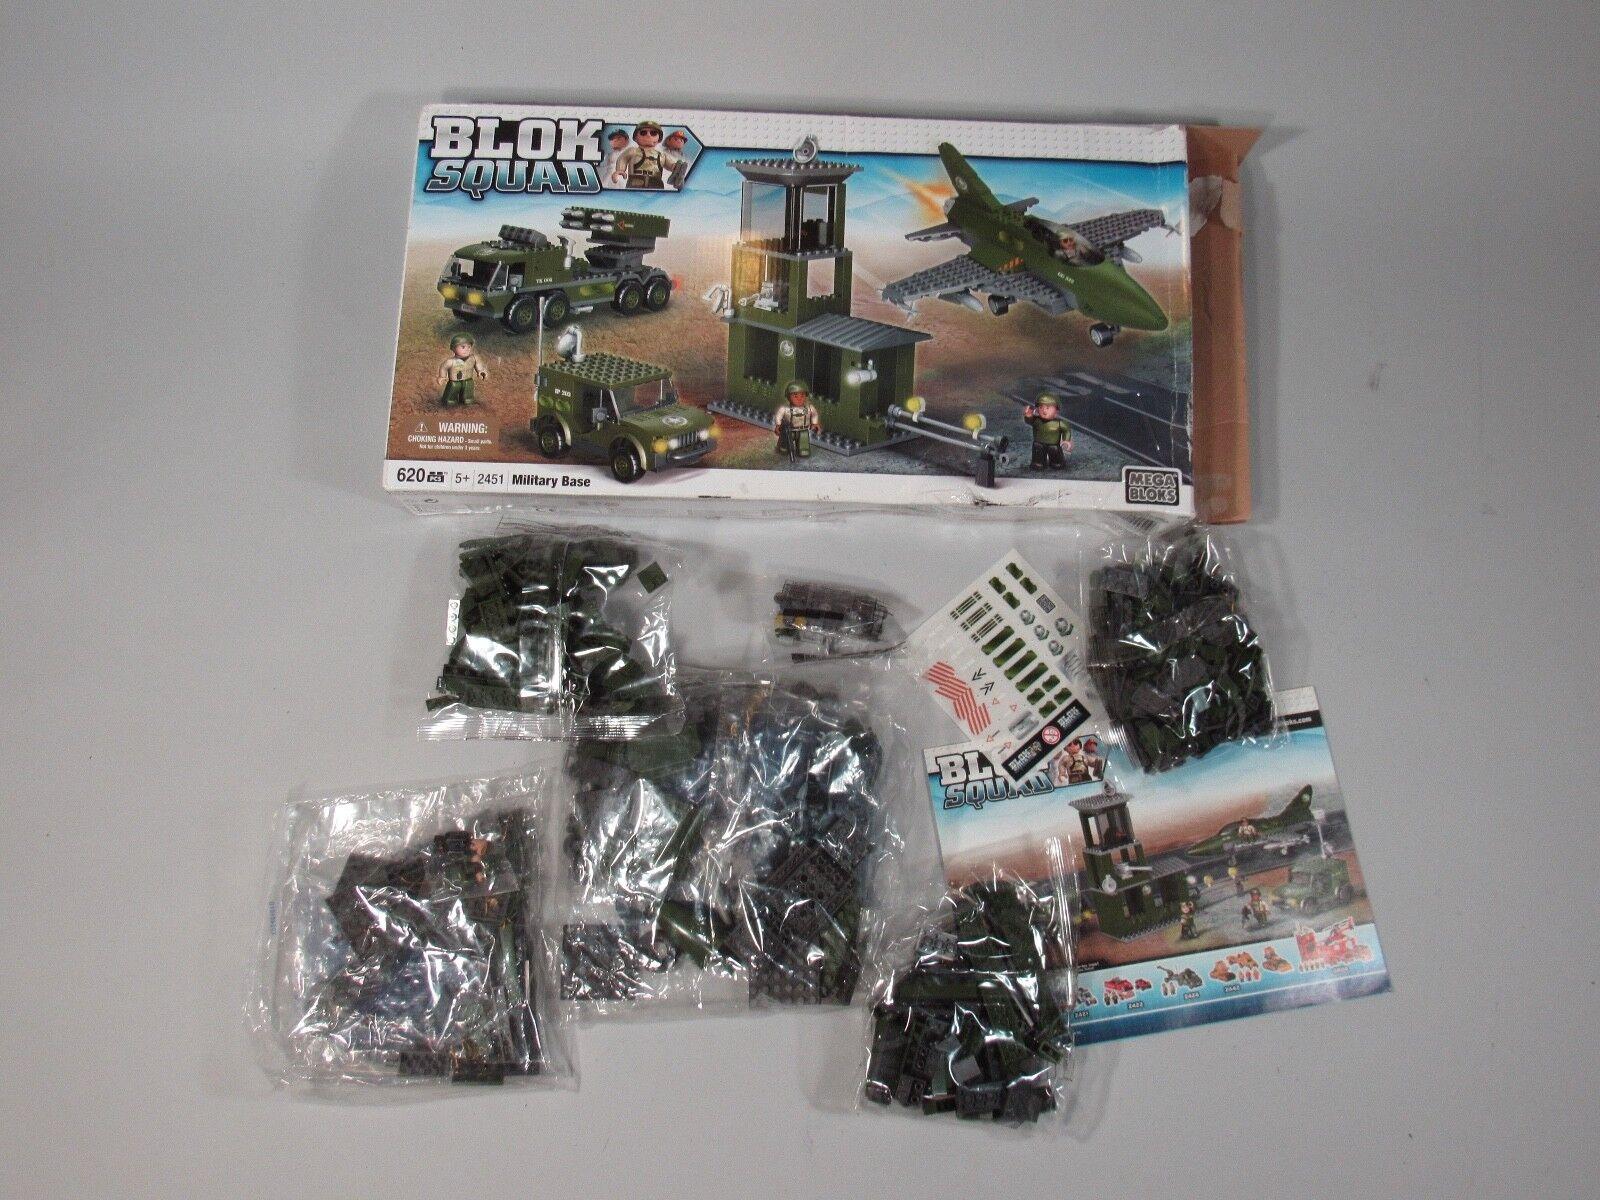 Blok Squad Military Base Mega Blok 620 pcs. Discontinued New In Open Box